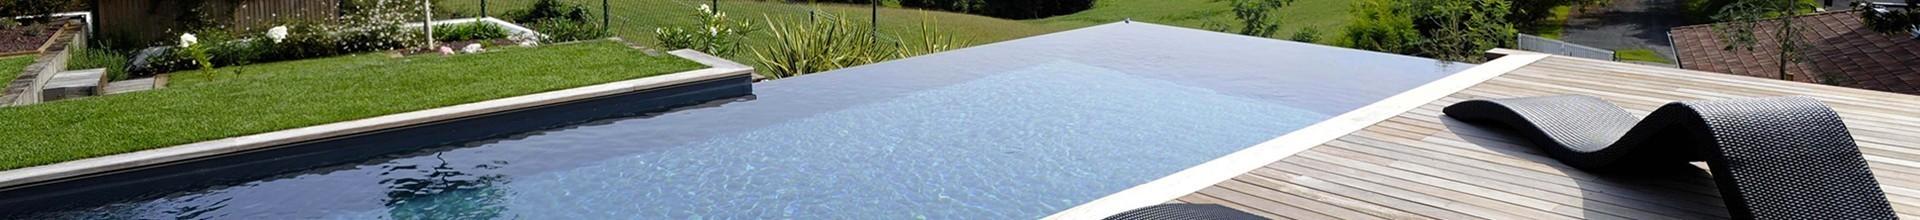 Direct usine, piscine coque prix Mons